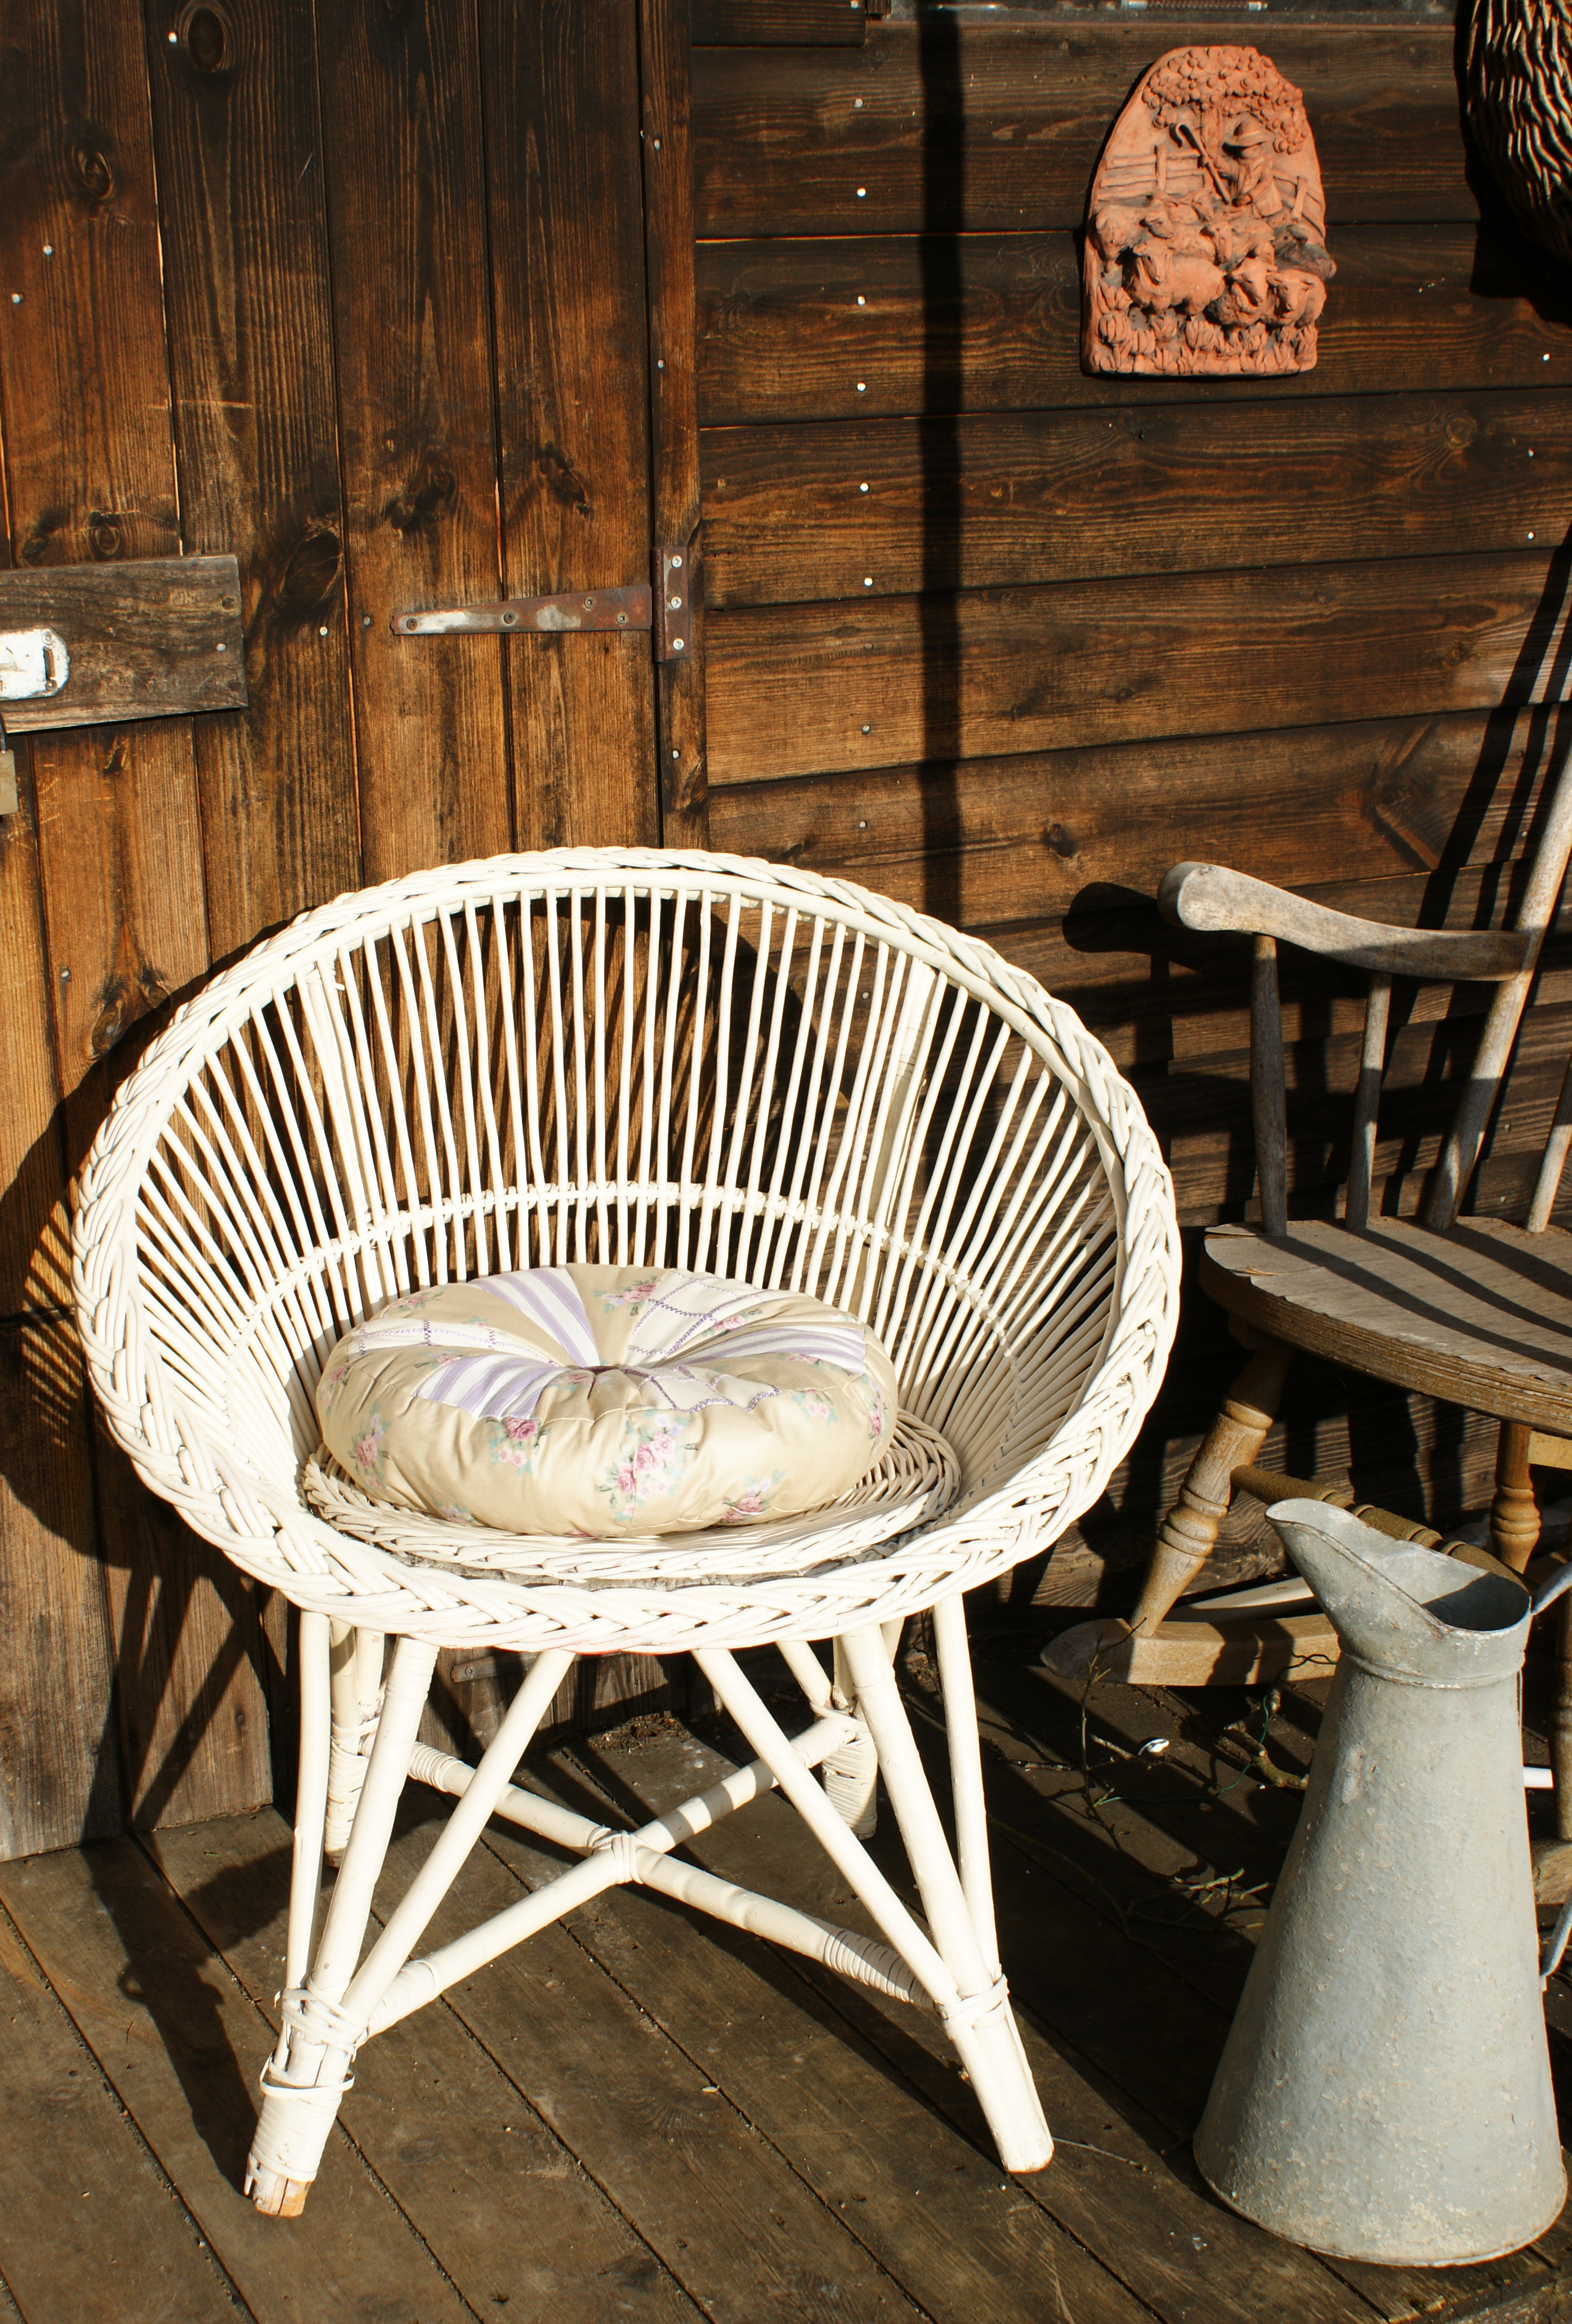 Vintage Wicker Chair | Adaliza